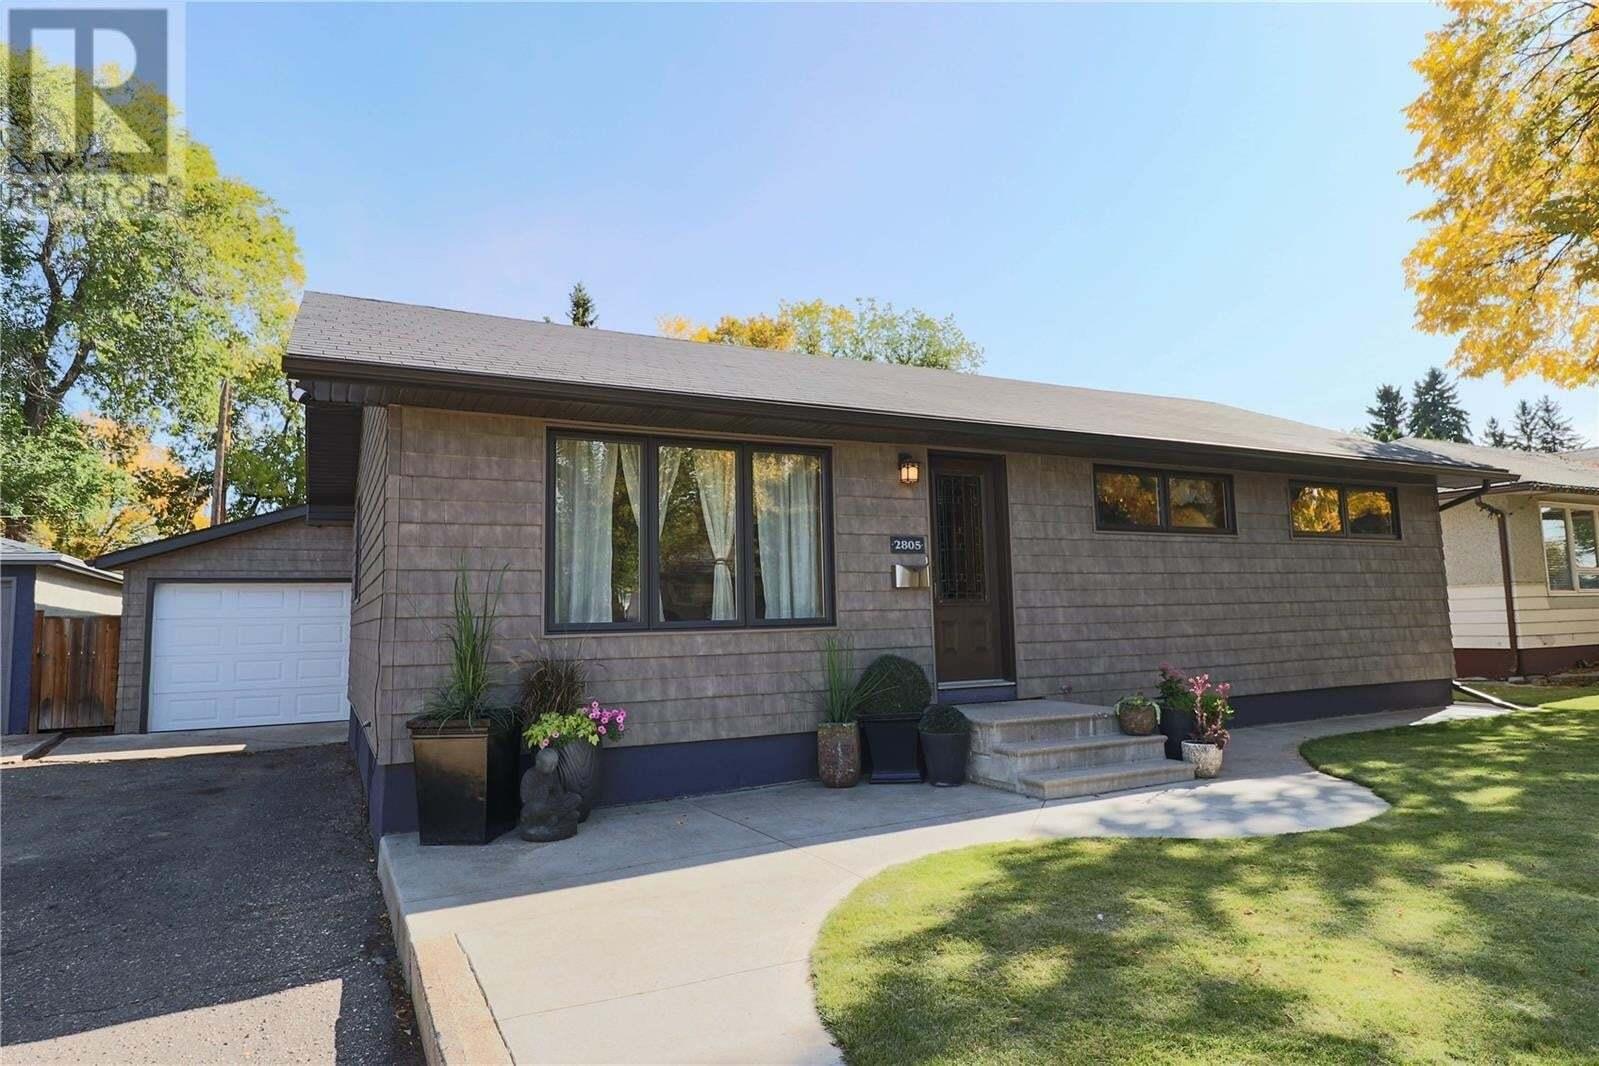 House for sale at 2805 Ferguson Ave Saskatoon Saskatchewan - MLS: SK827629